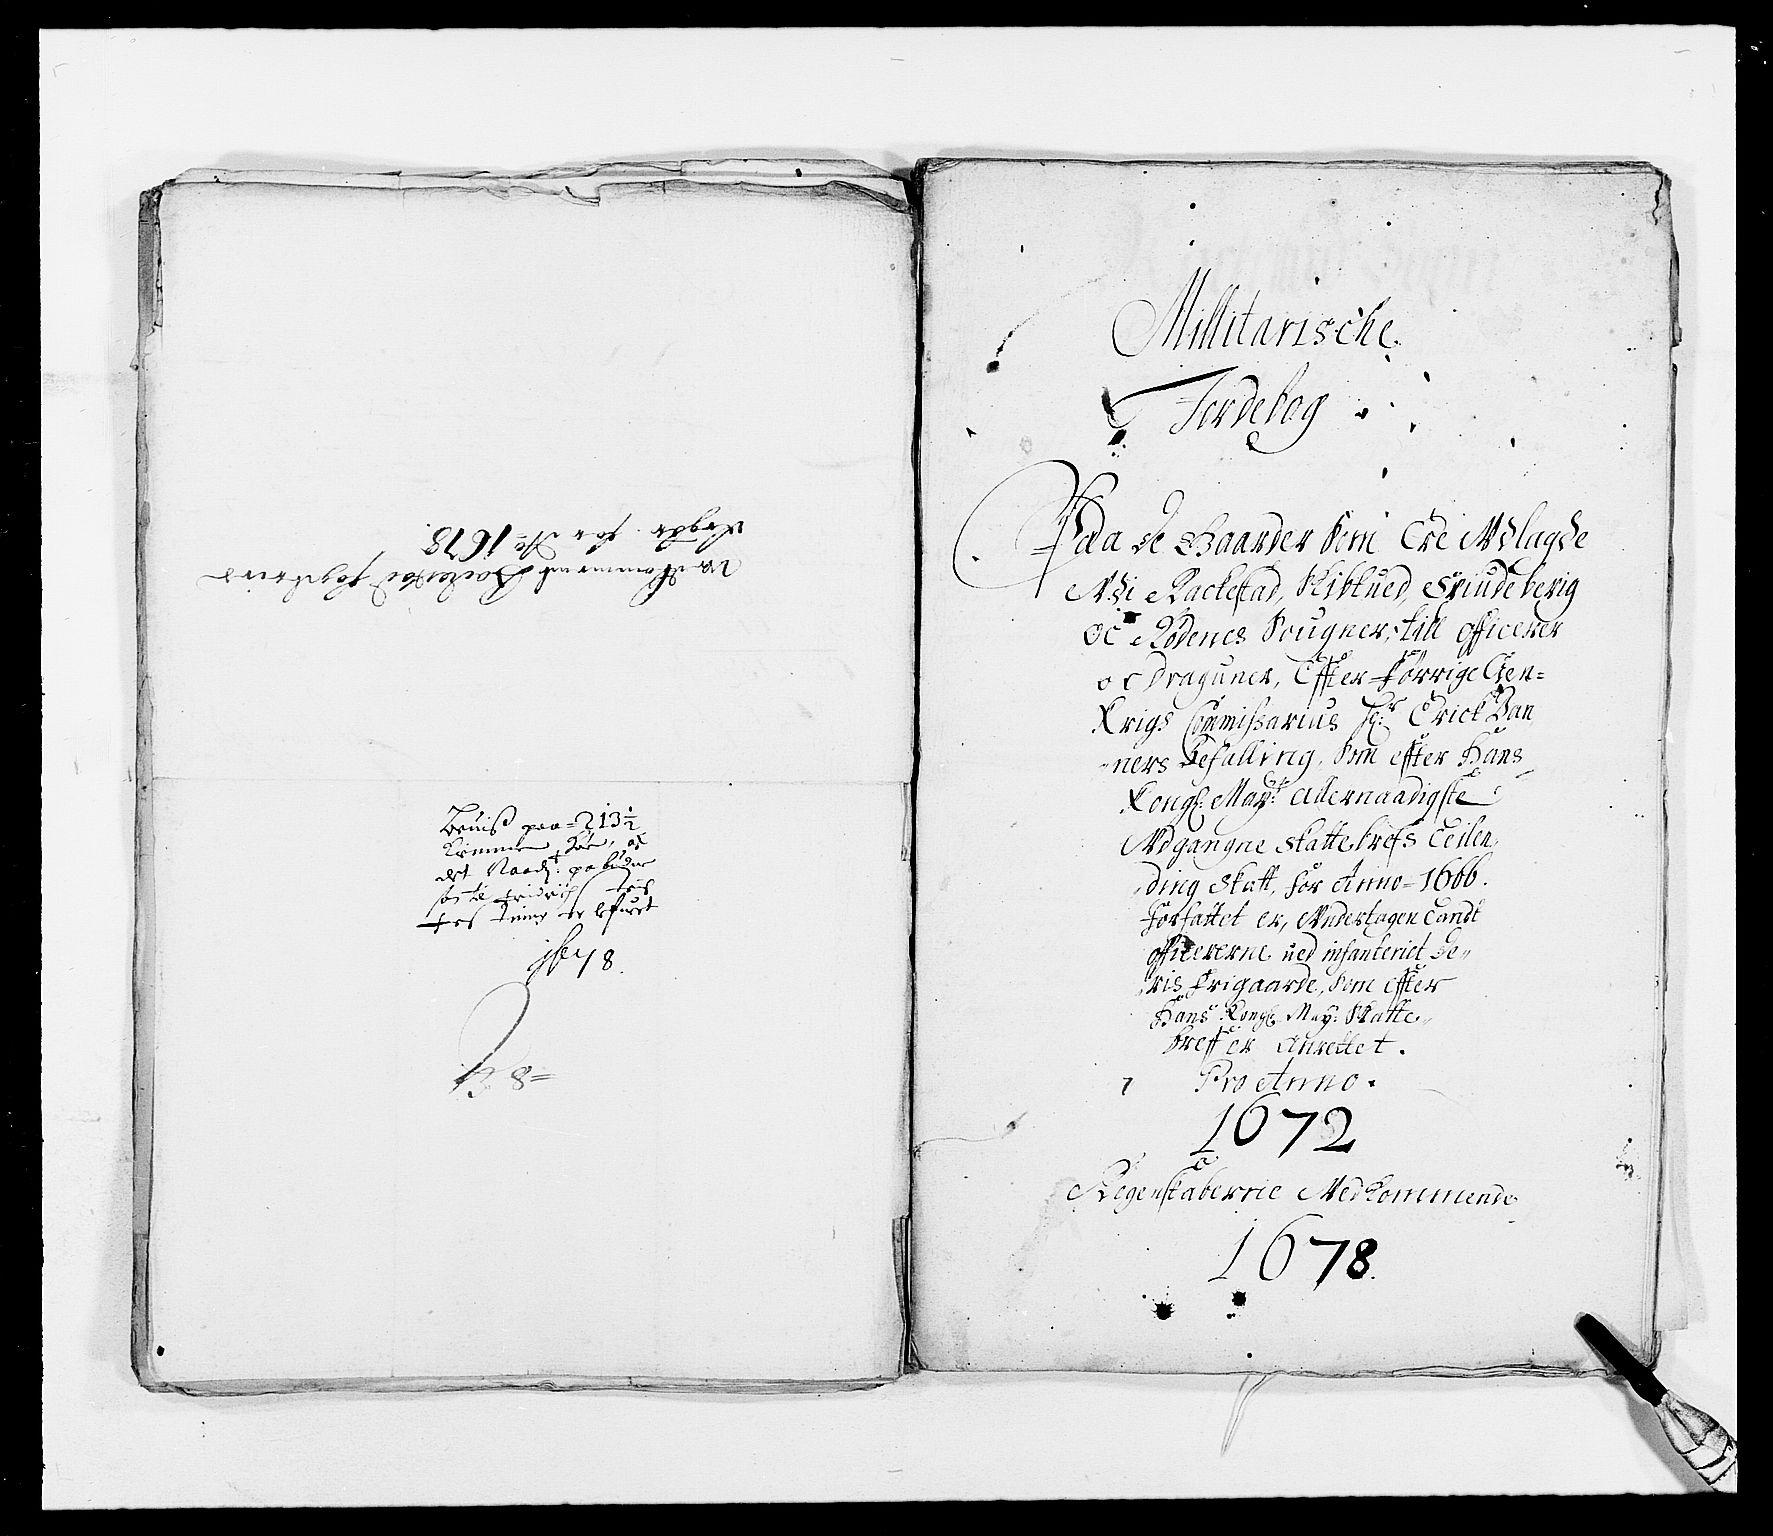 RA, Rentekammeret inntil 1814, Reviderte regnskaper, Fogderegnskap, R05/L0271: Fogderegnskap Rakkestad, 1678-1679, s. 514